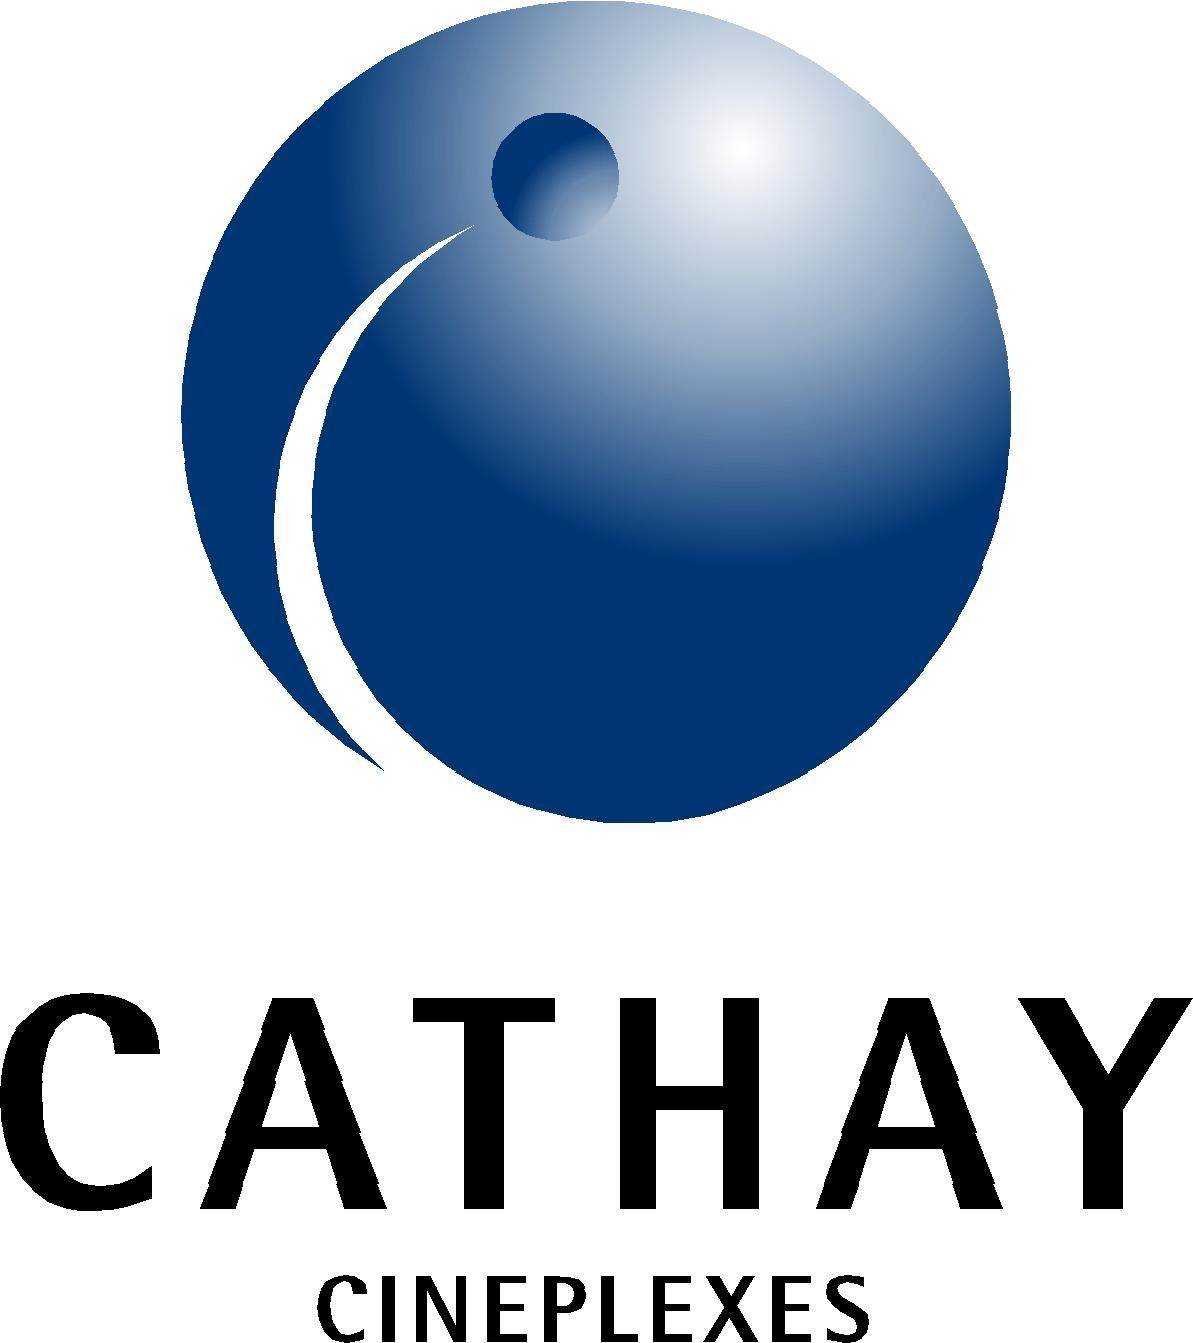 Cathay Cineplex Malaysia